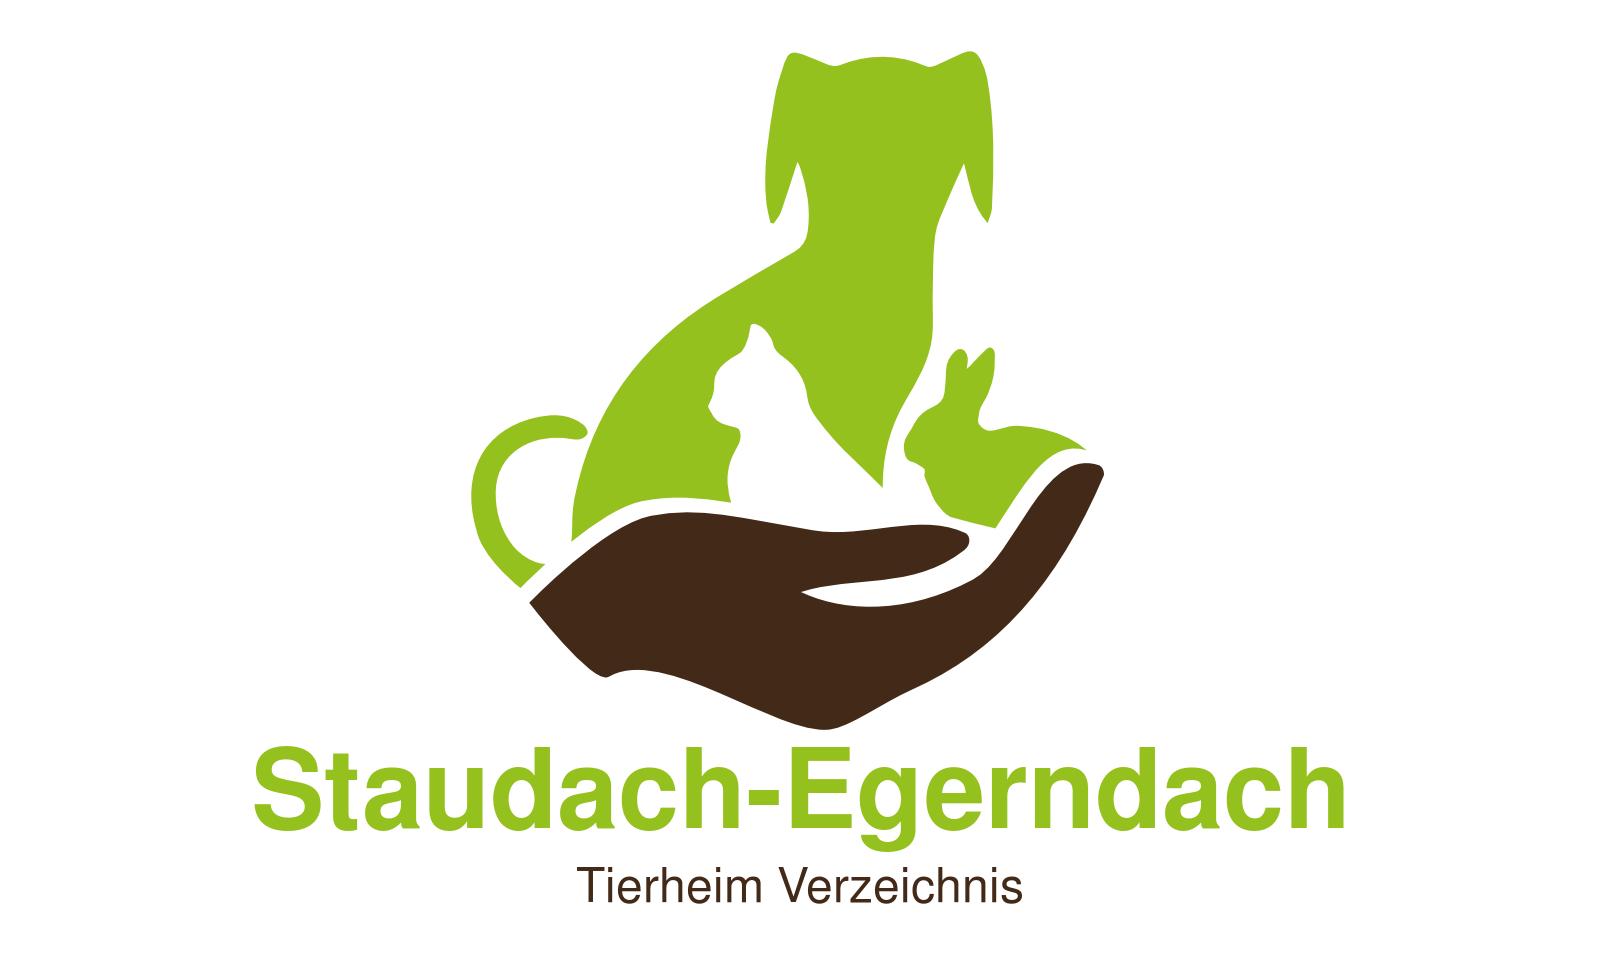 Tierheim Staudach-Egerndach